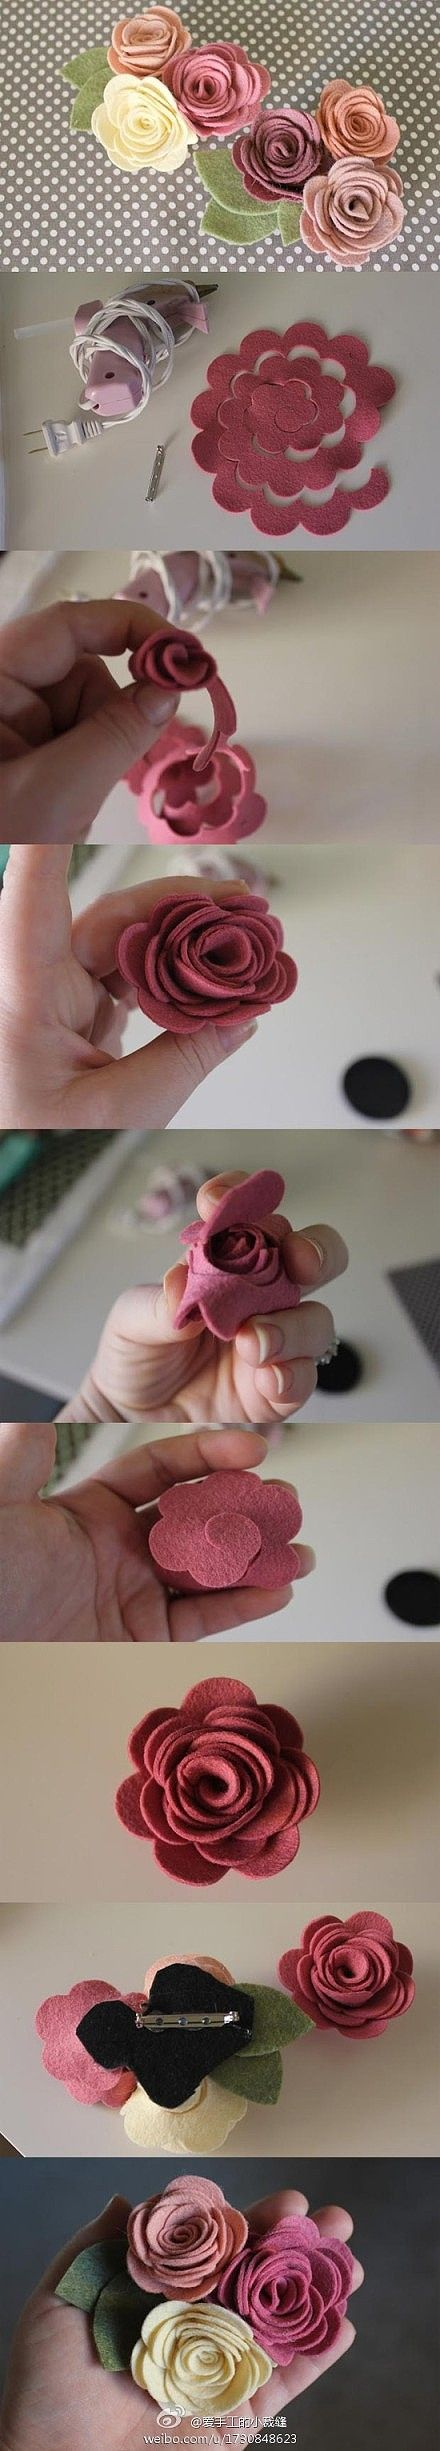 Coldplay DIY tessuto carta a mano di arte Tutorial fai da te # # handmade fiori @ dolce Xiangxi non dolce raccolta di idee creative ...